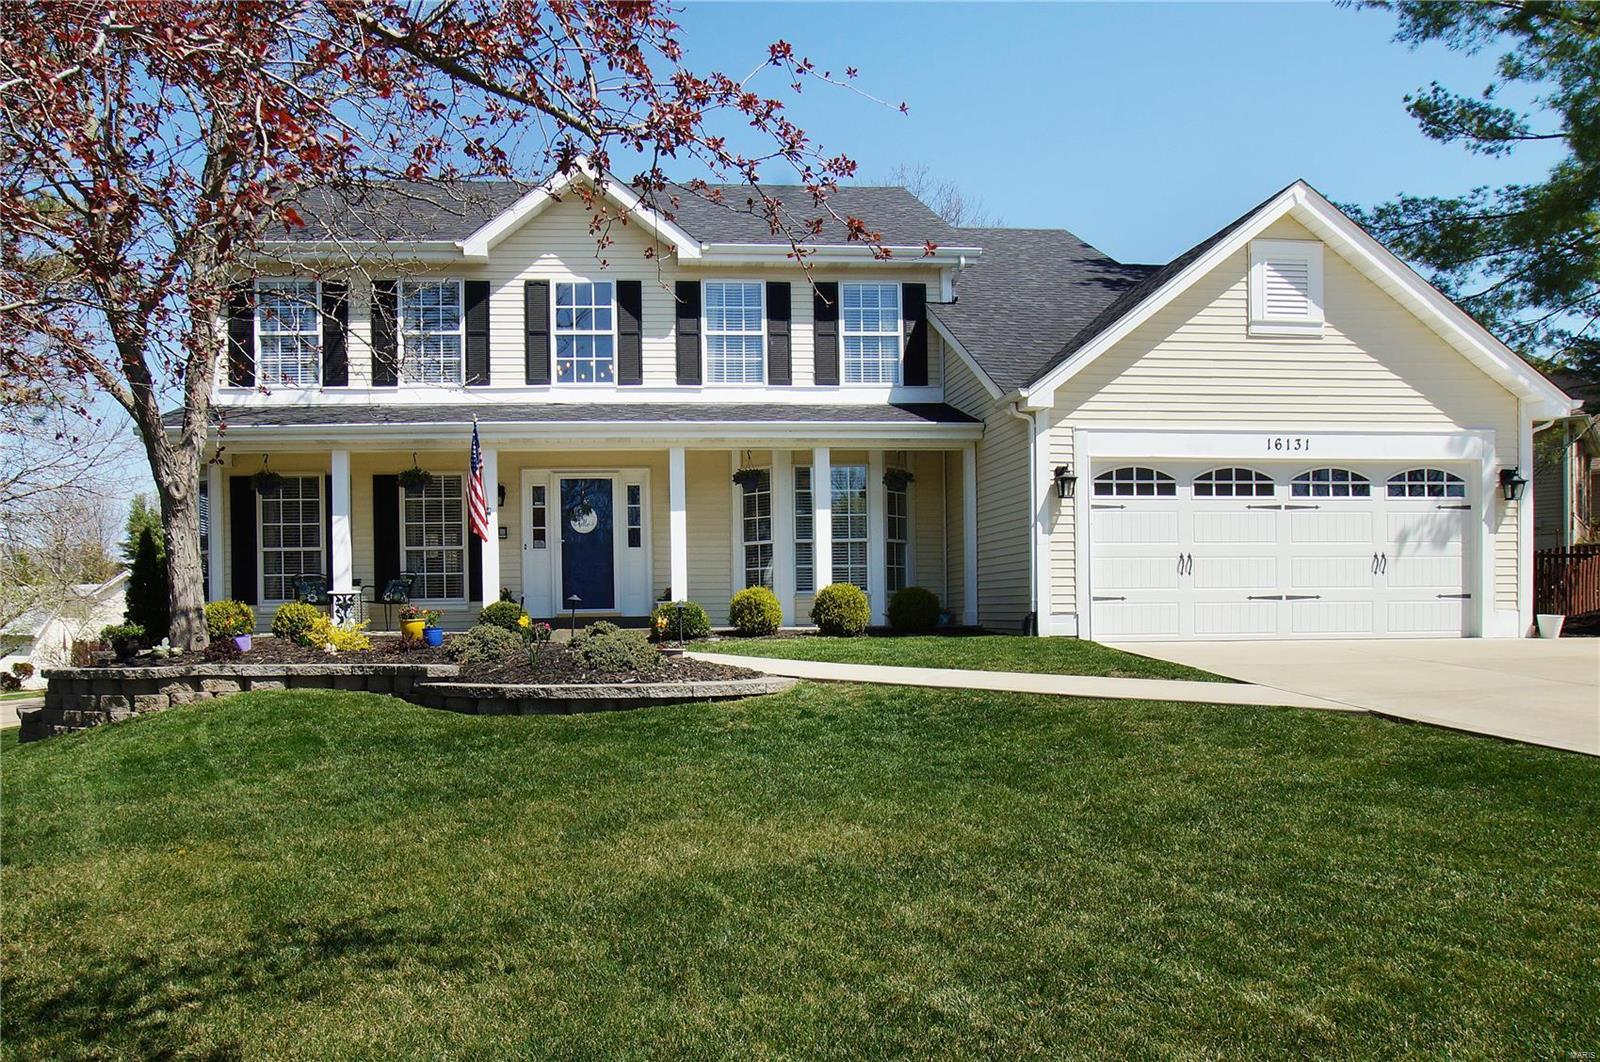 16131 Copper Ridge Court Property Photo - Grover, MO real estate listing